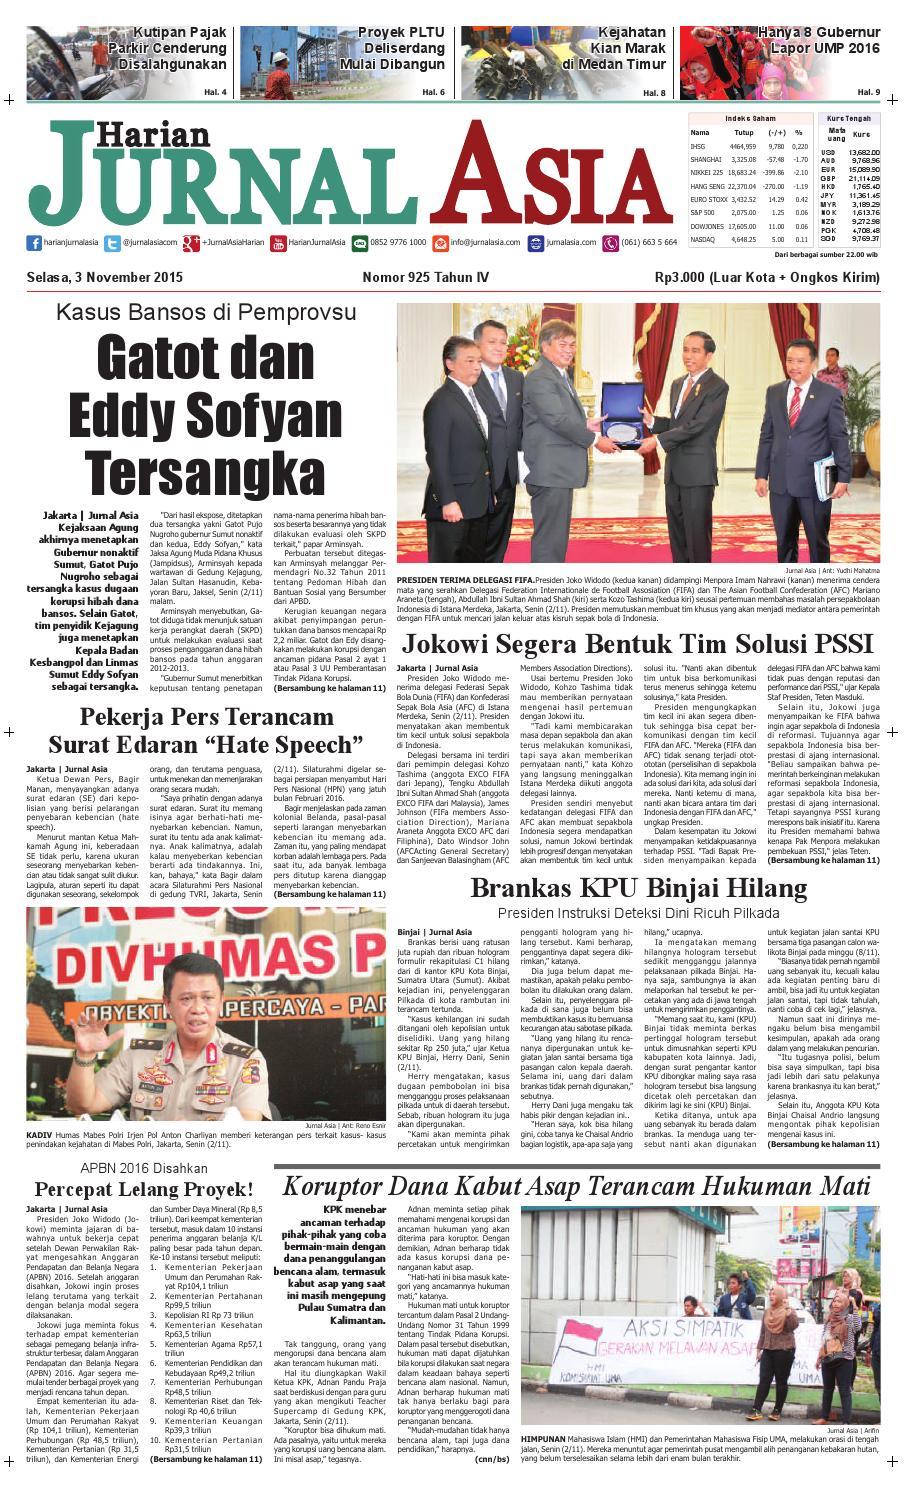 Harian Jurnal Asia Edisi Selasa 03 November 2015 By Produk Ukm Bumn Kain Batik Middle Premium 3 Bendera 01 Medan Issuu